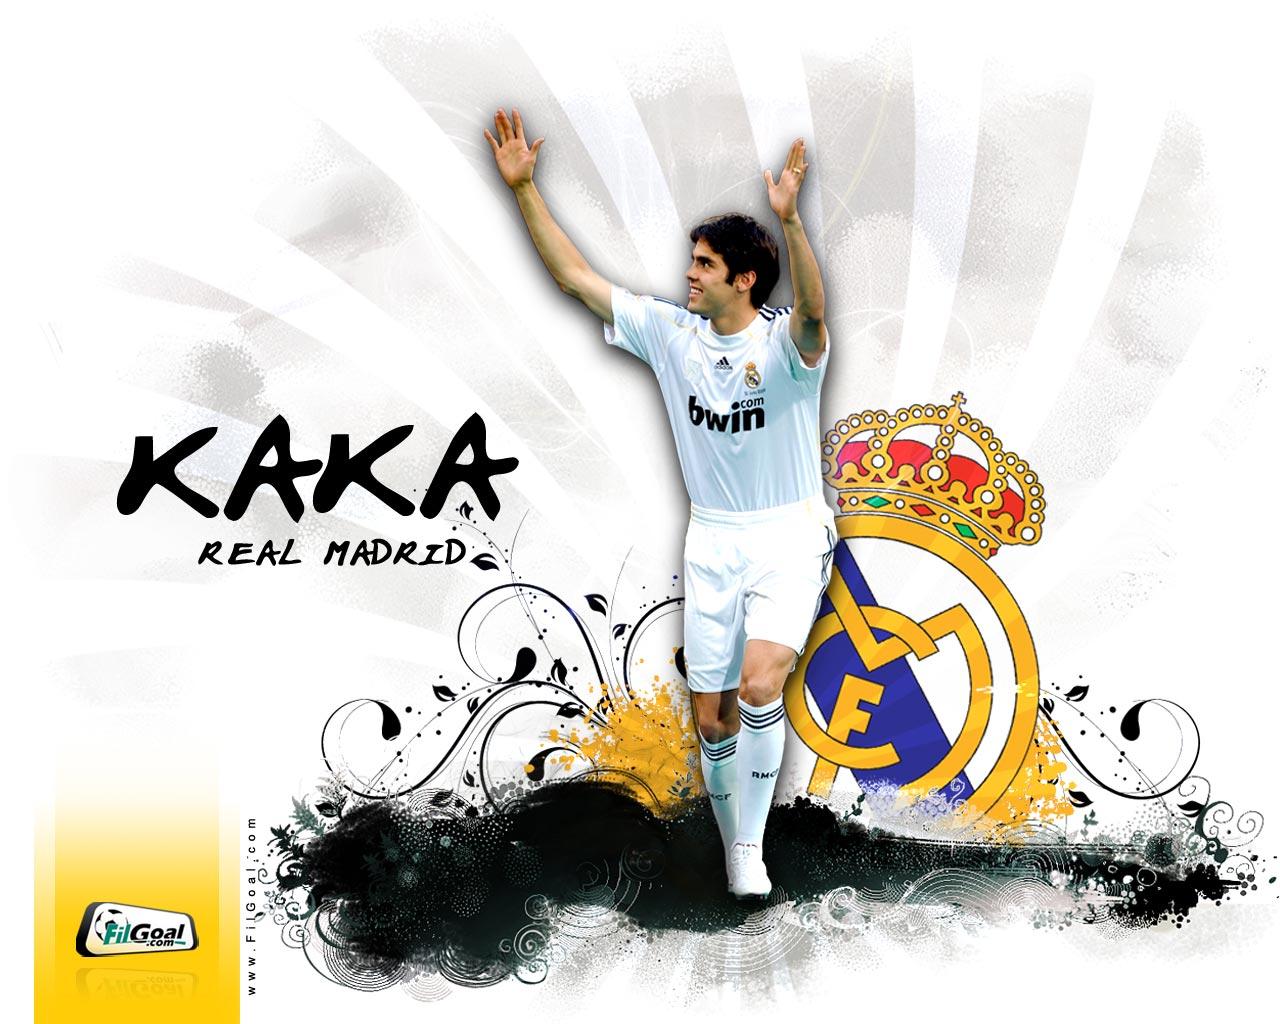 Fc Real Madrid Wallpaper